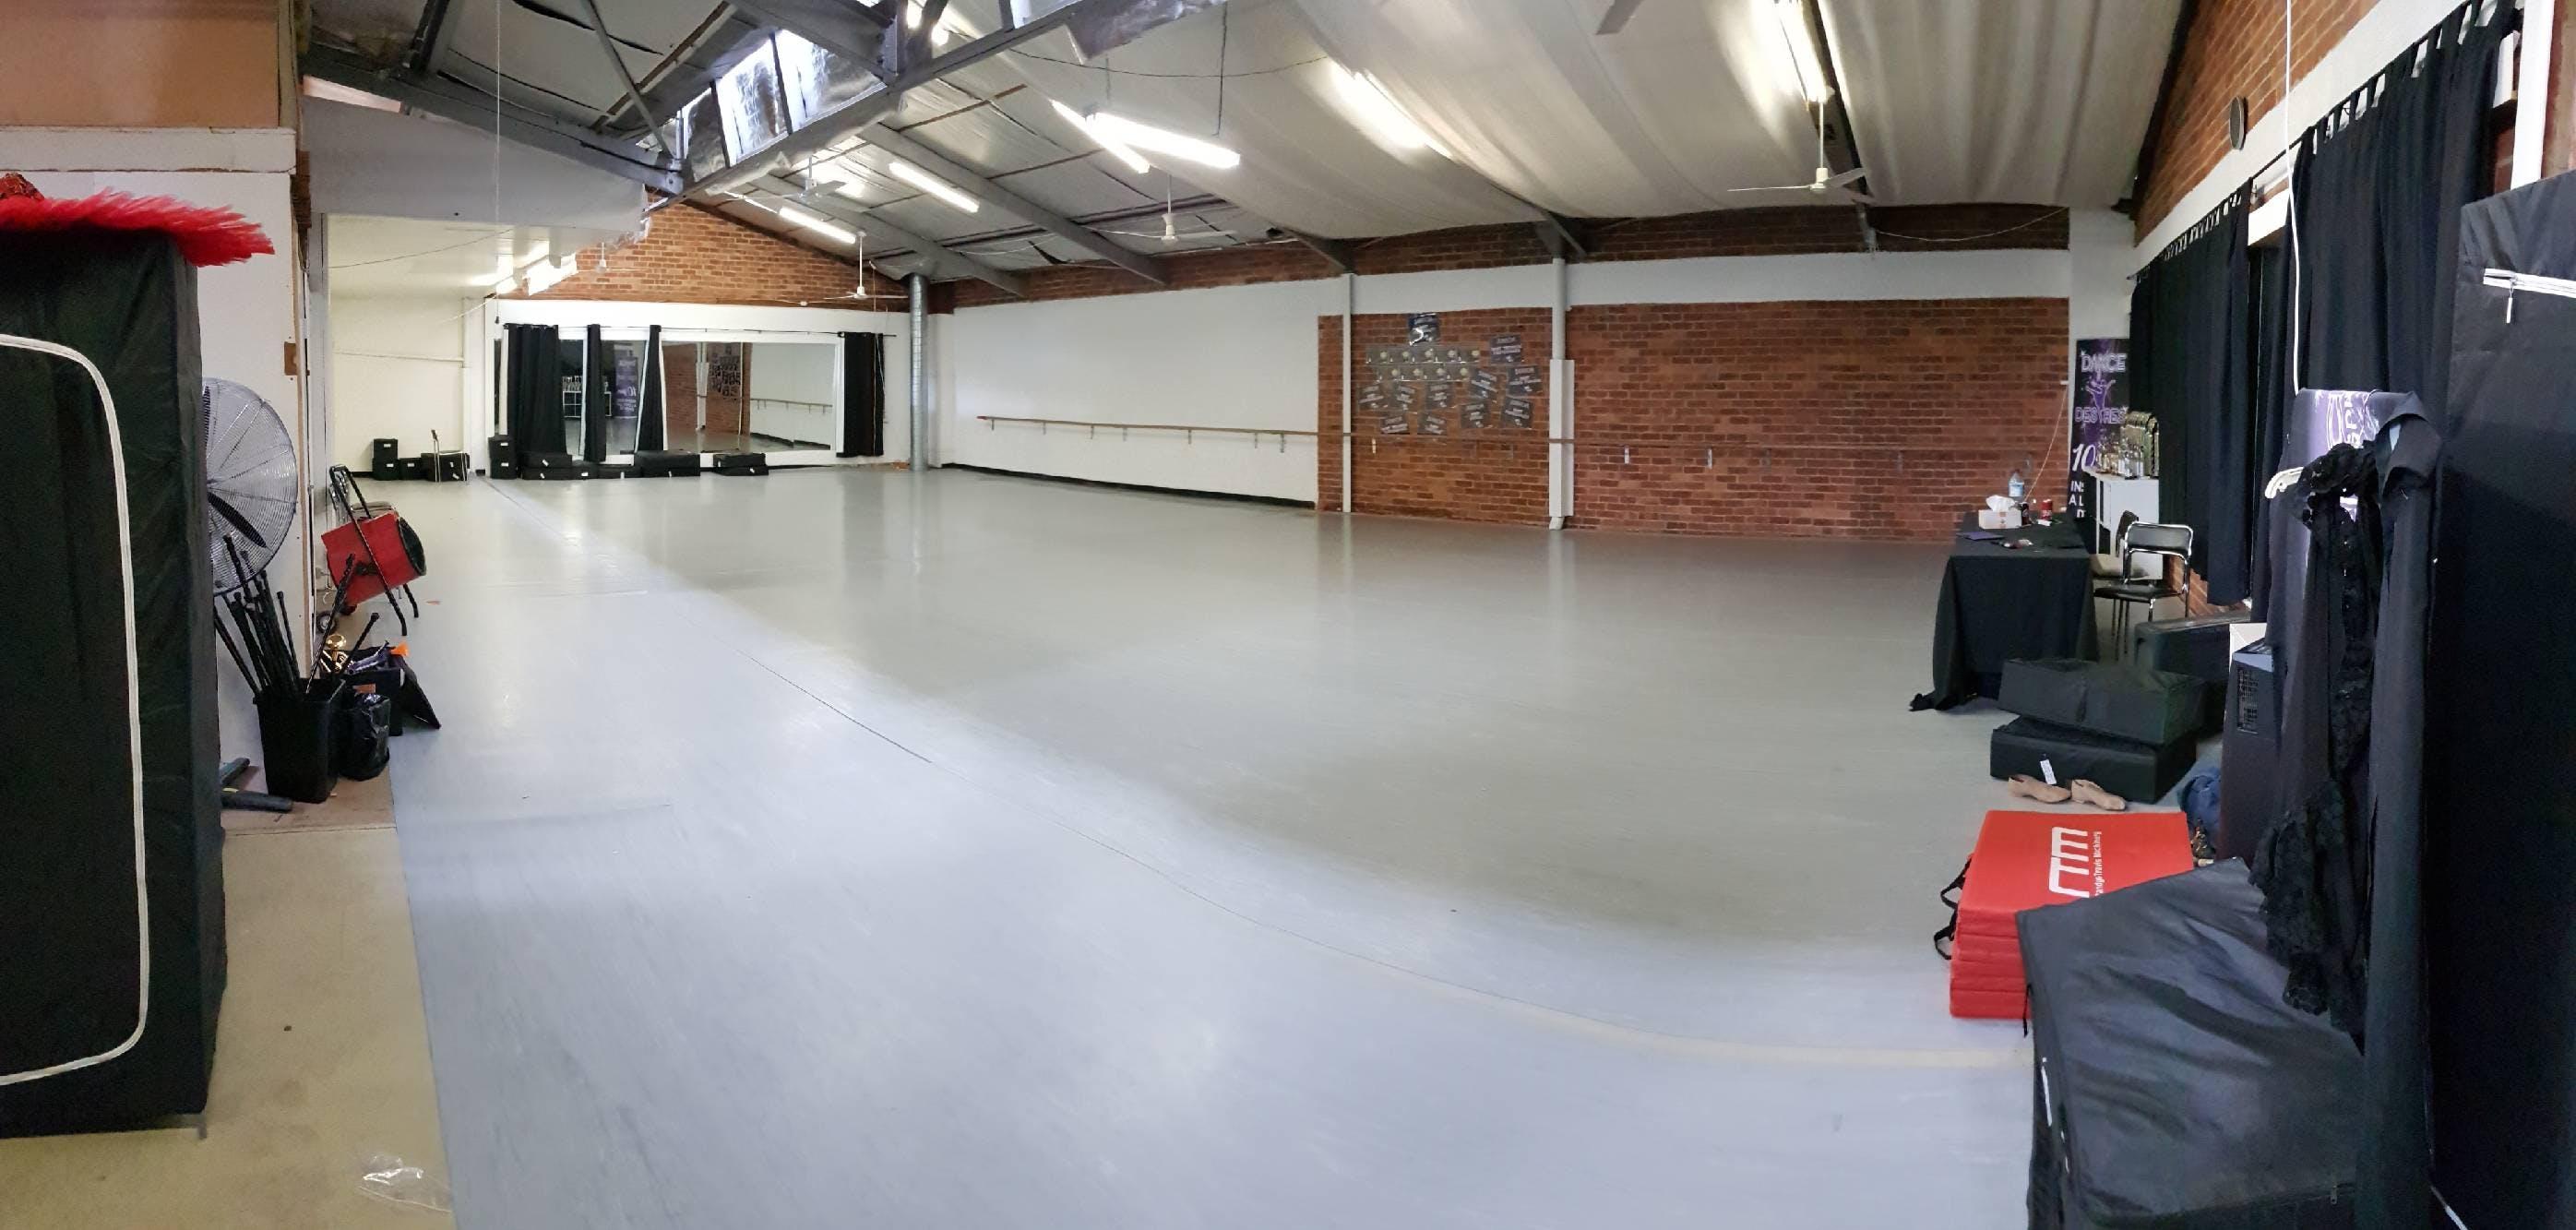 Studio 5, creative studio at Dance Be In It Centre, image 1